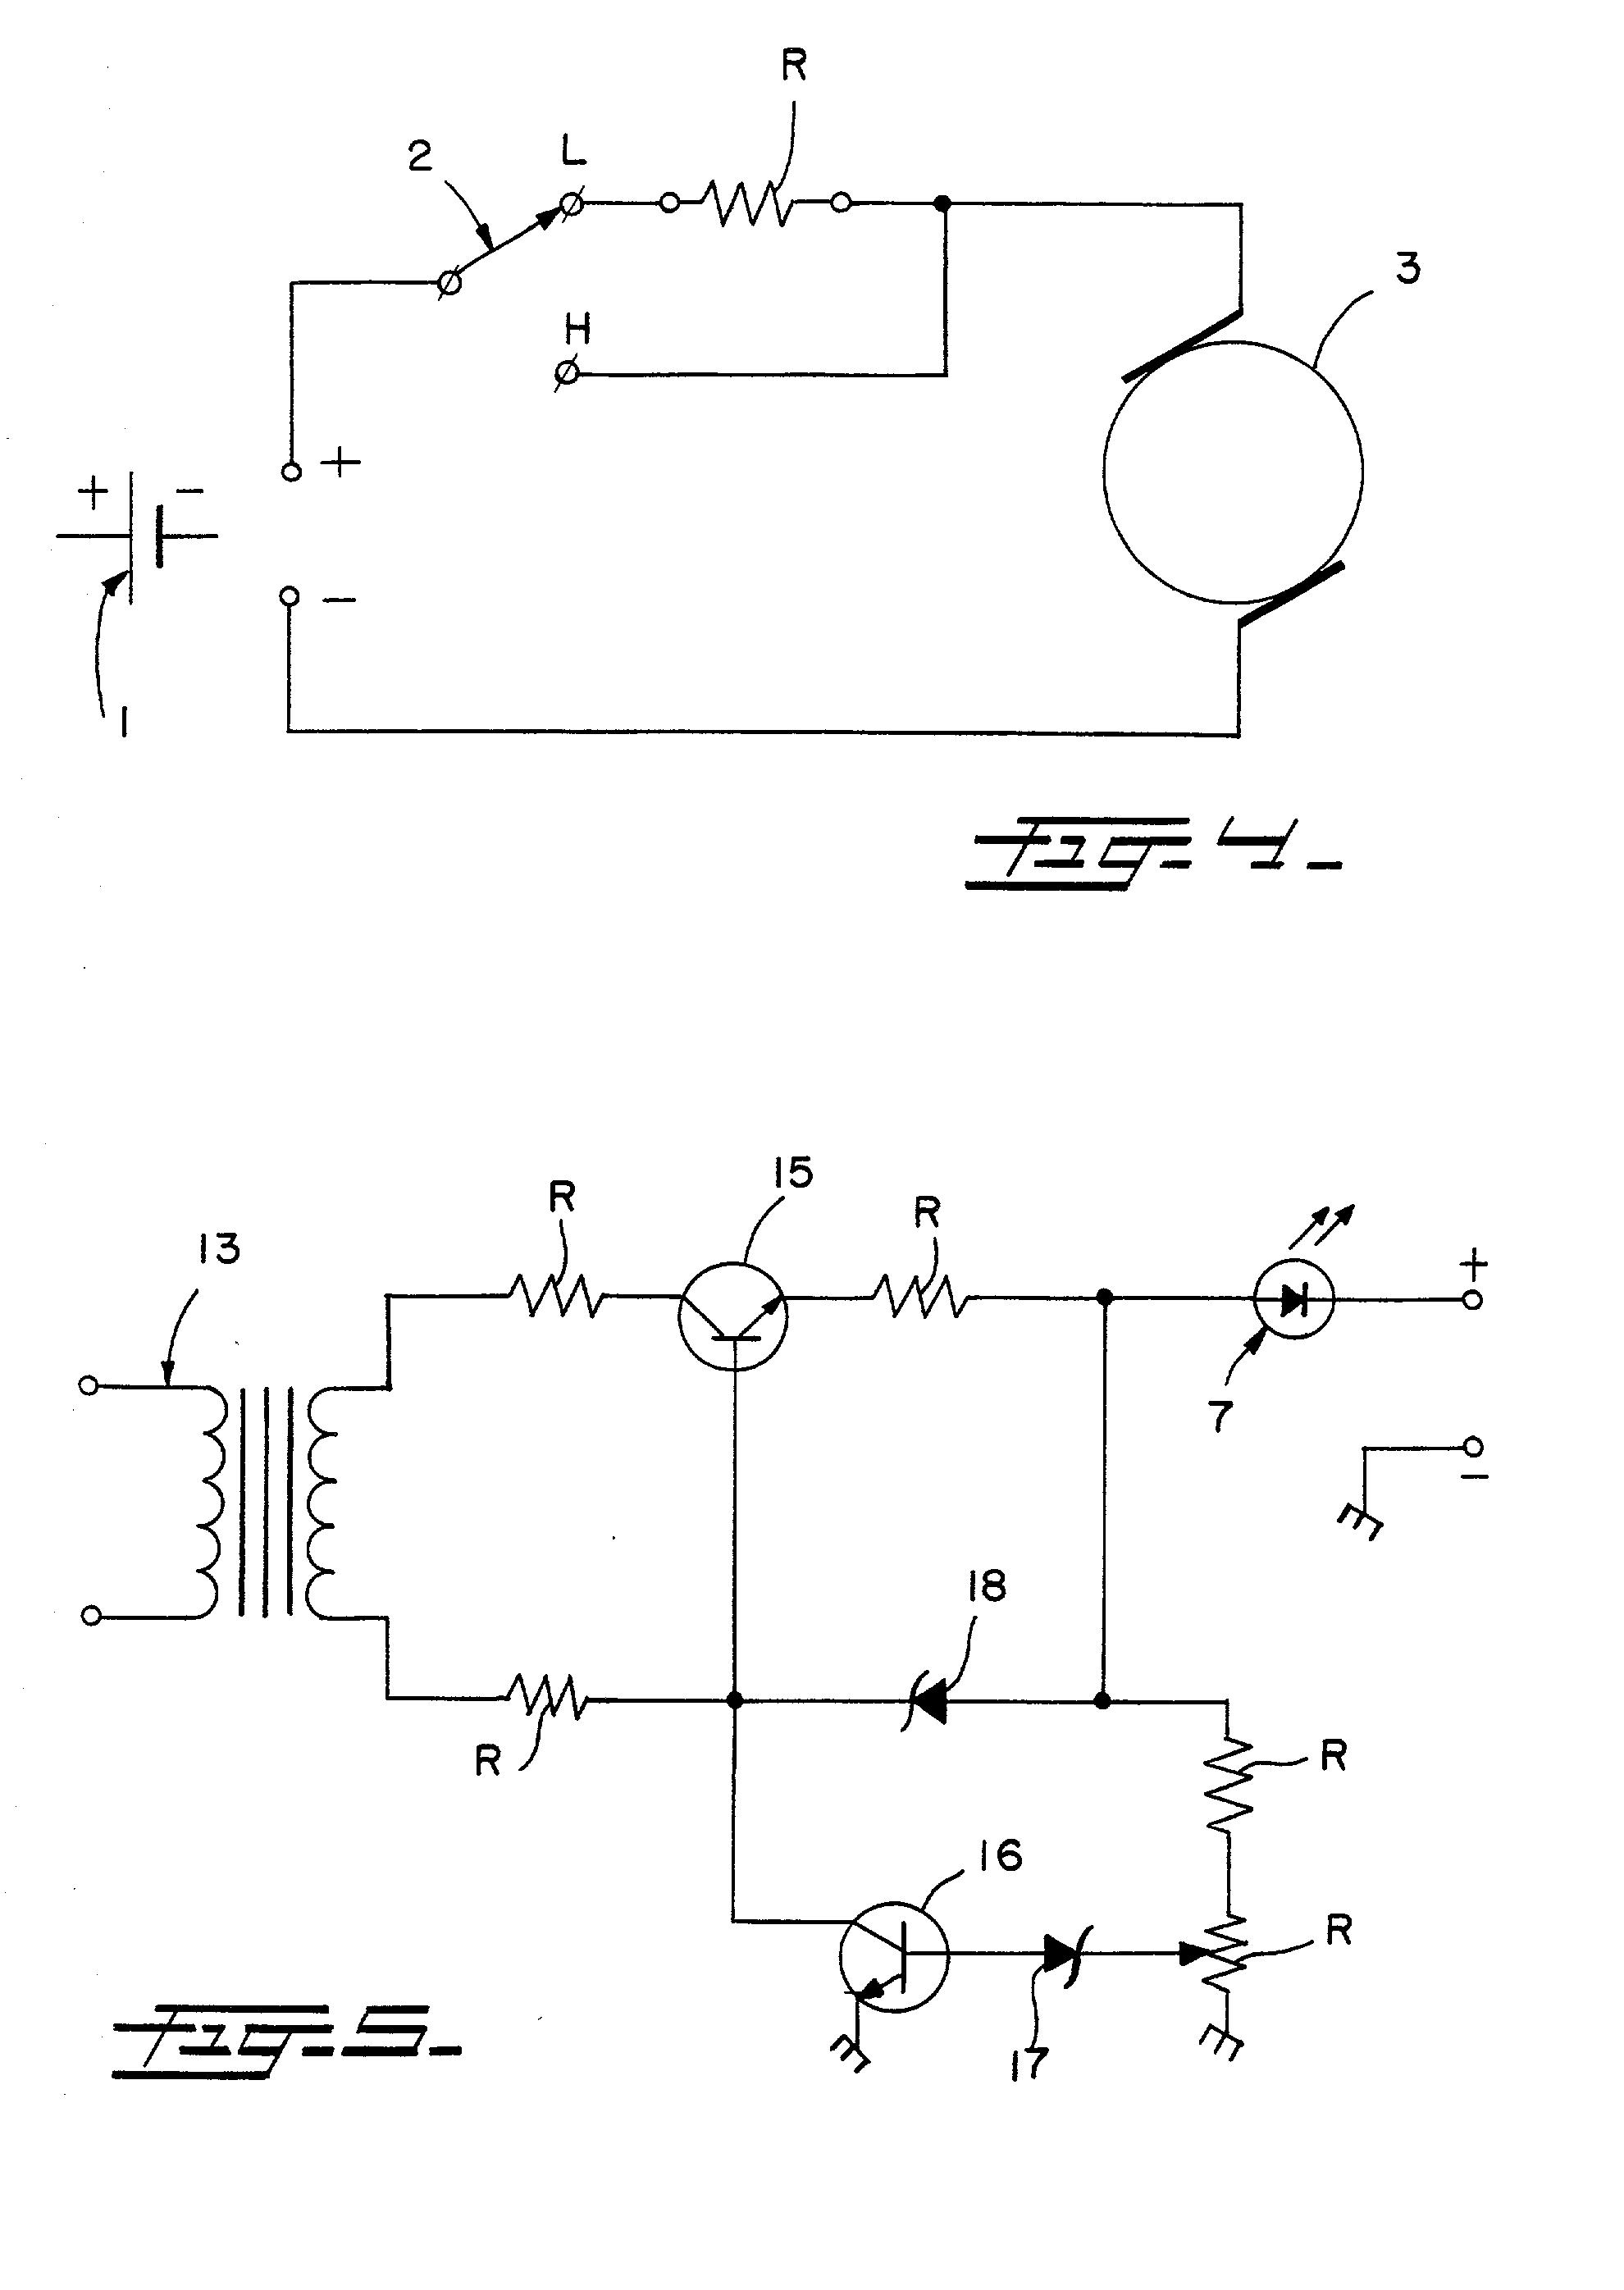 xlerator hand dryer wiring diagram 240 dryer diagram